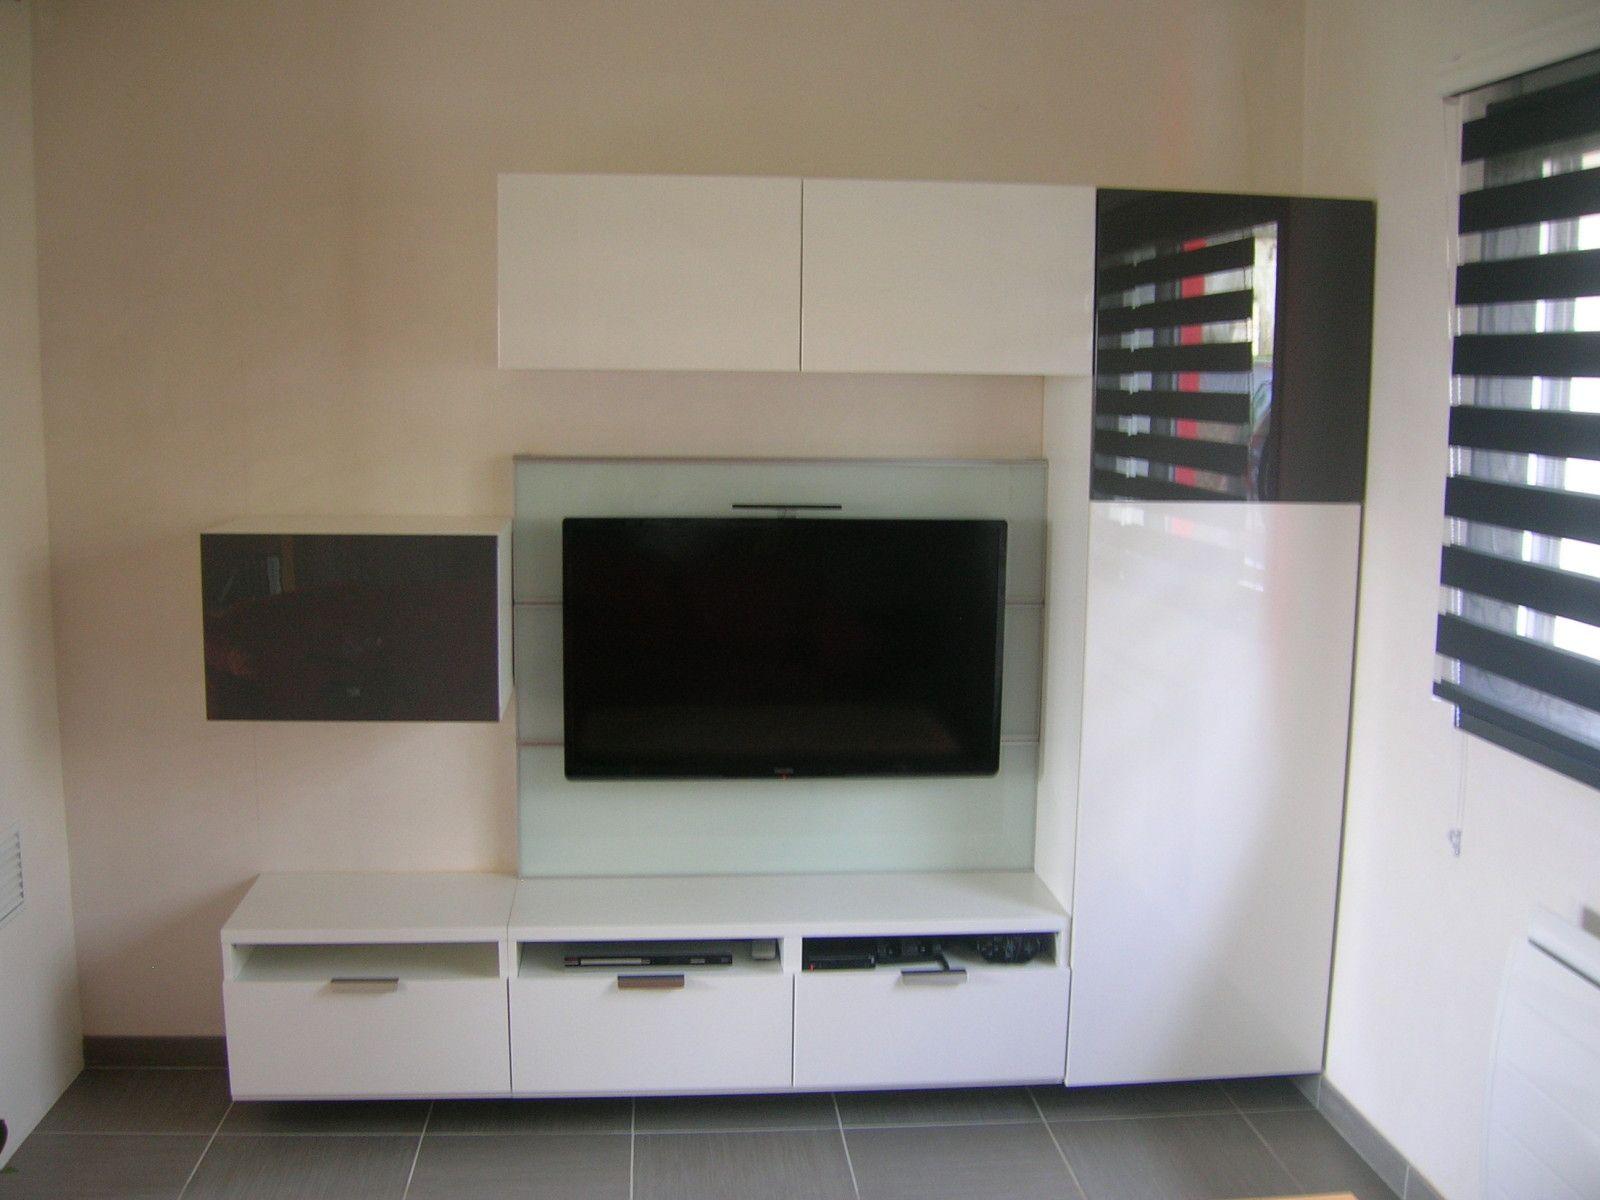 Panneau Tv Ikea - Album 6 Banc Tv Besta Ikea Panneau Framsta R Alisations [mjhdah]https://i.pinimg.com/originals/2a/d3/e5/2ad3e562b1dbc0a7f1b24a426a4ac166.jpg